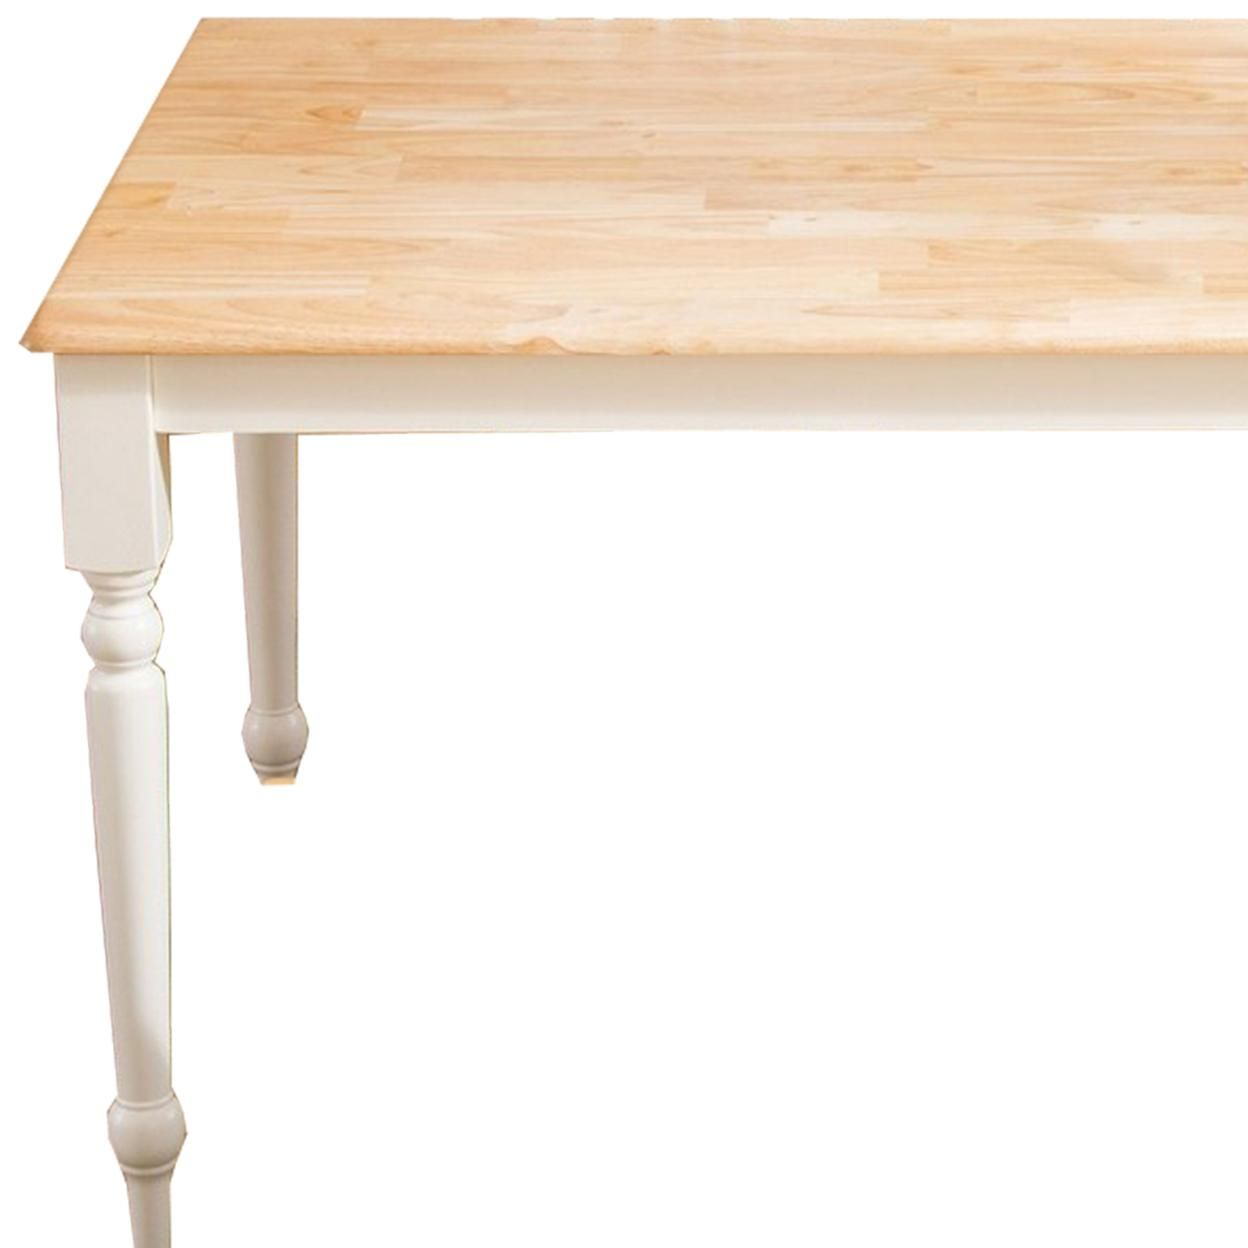 Saltoro Sherpi 6 Piece Farmhouse Wooden Dining Set, White and Brown